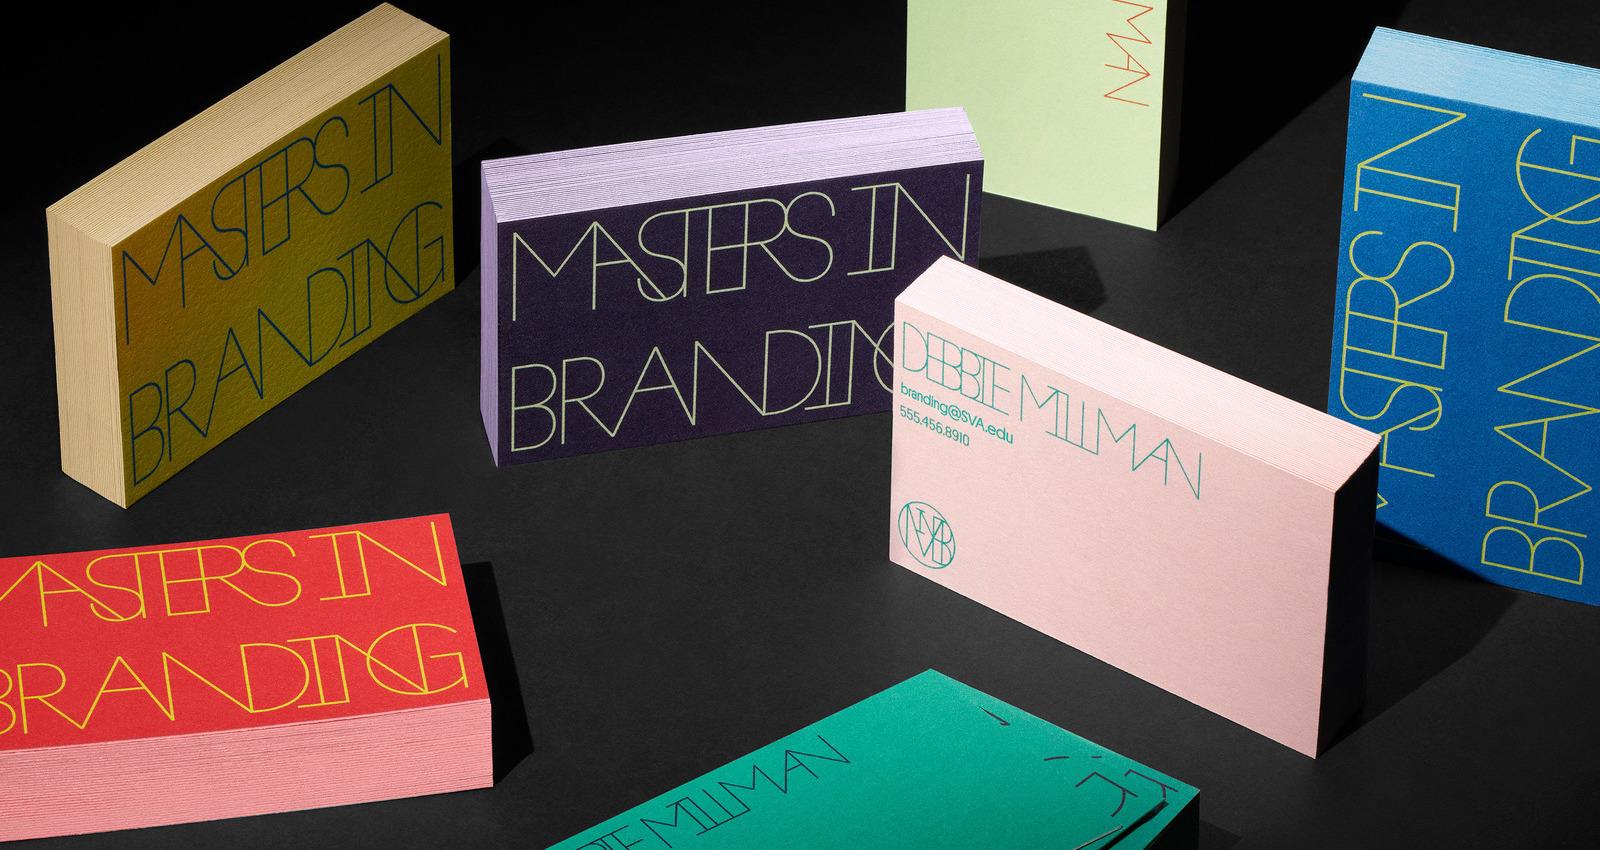 SVA Masters in Branding